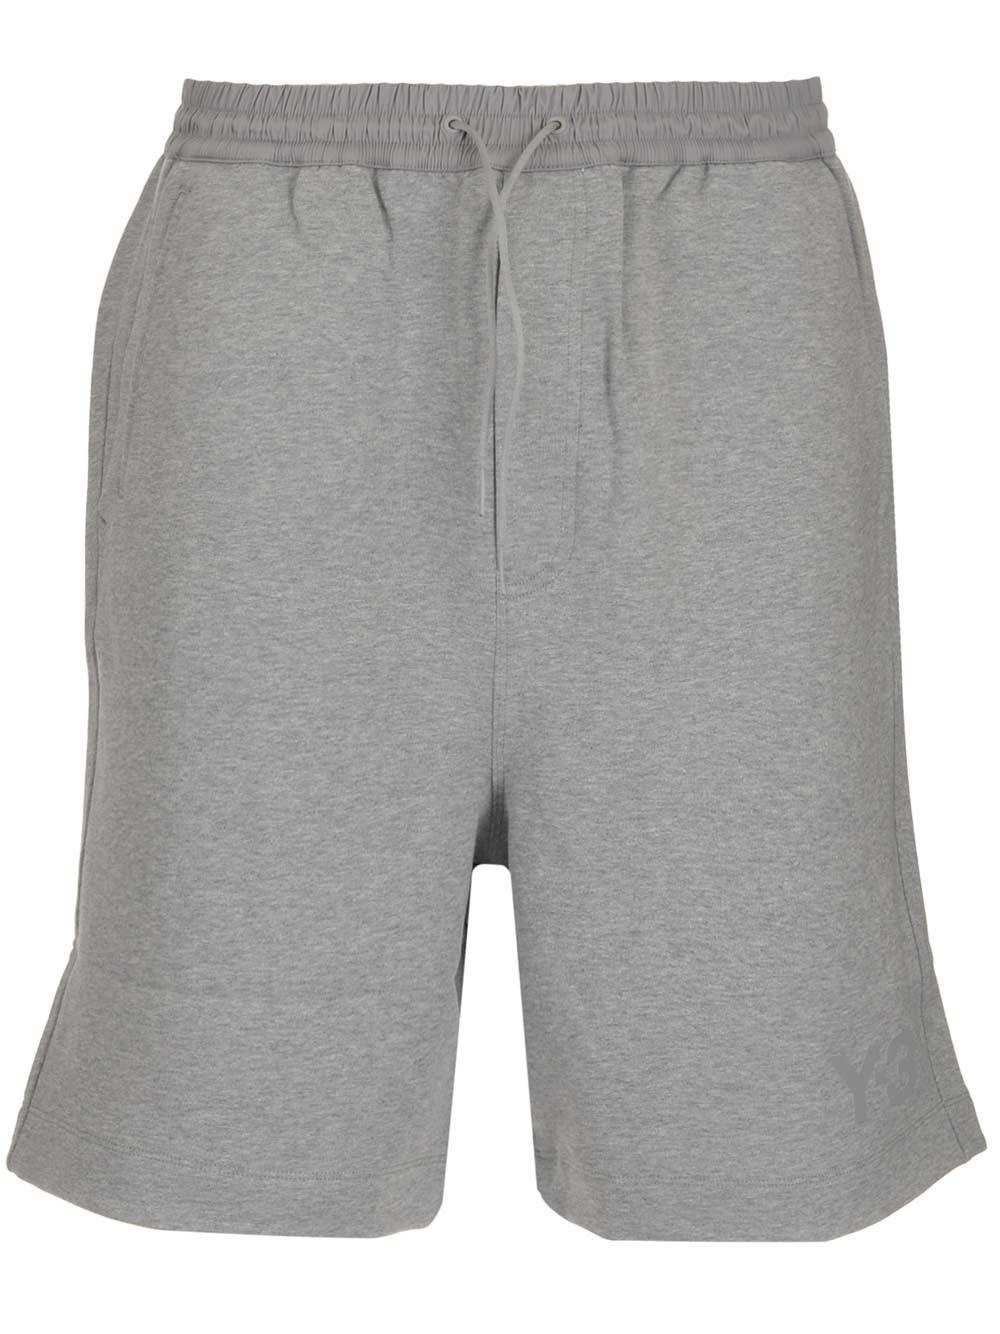 ADIDAS Y-3 Grey Casual Shorts